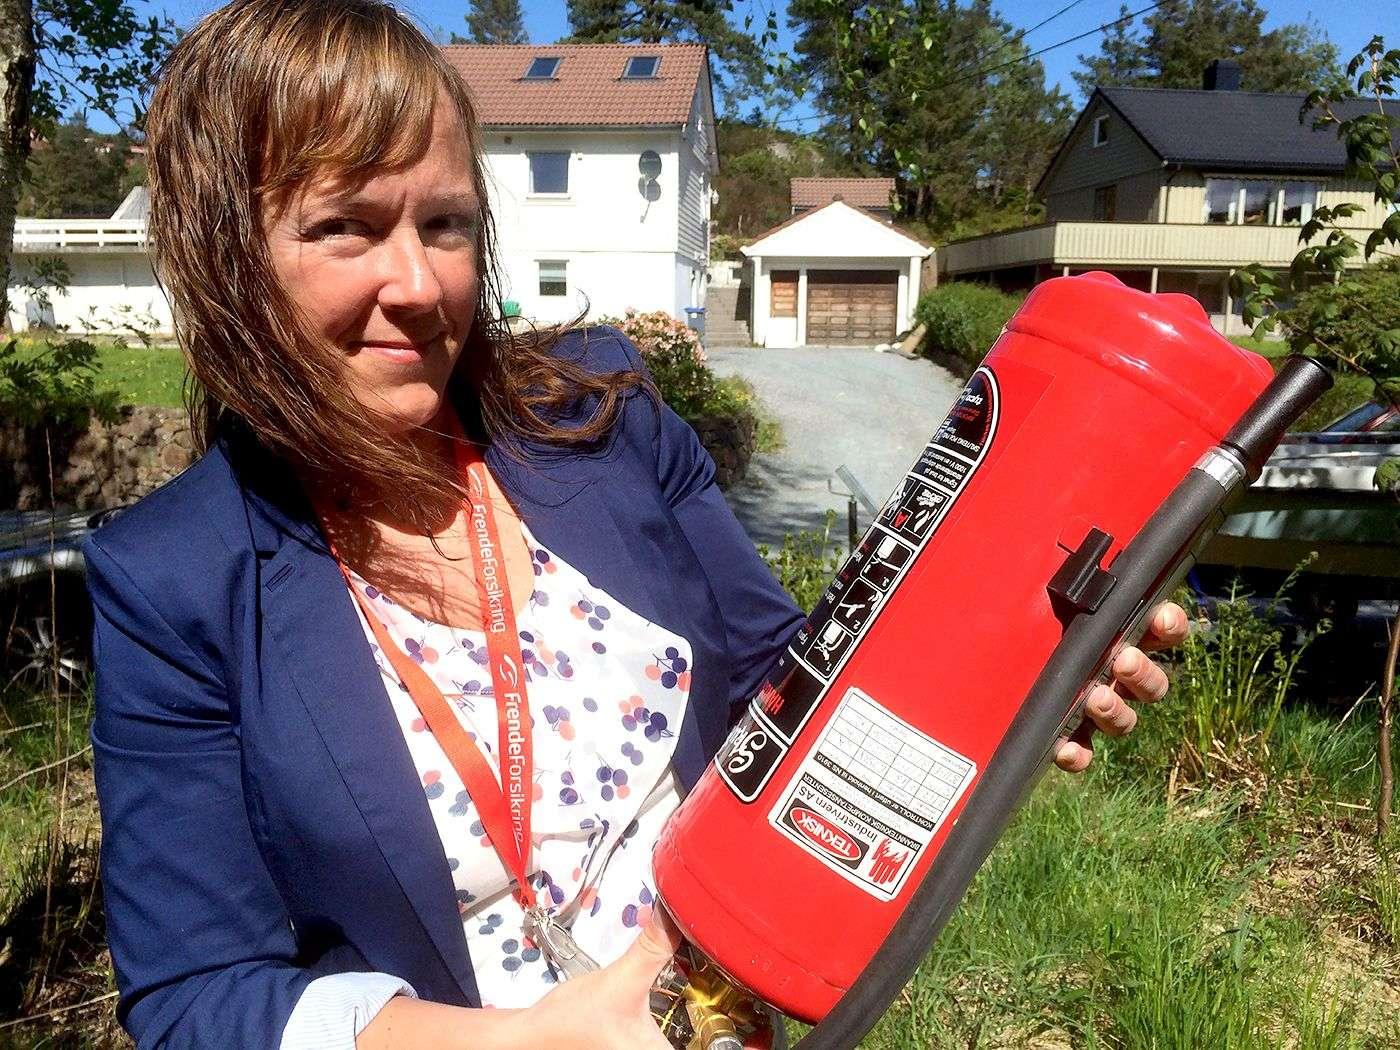 Heidi Tofterå Slettemoen med brannslukningsapparat